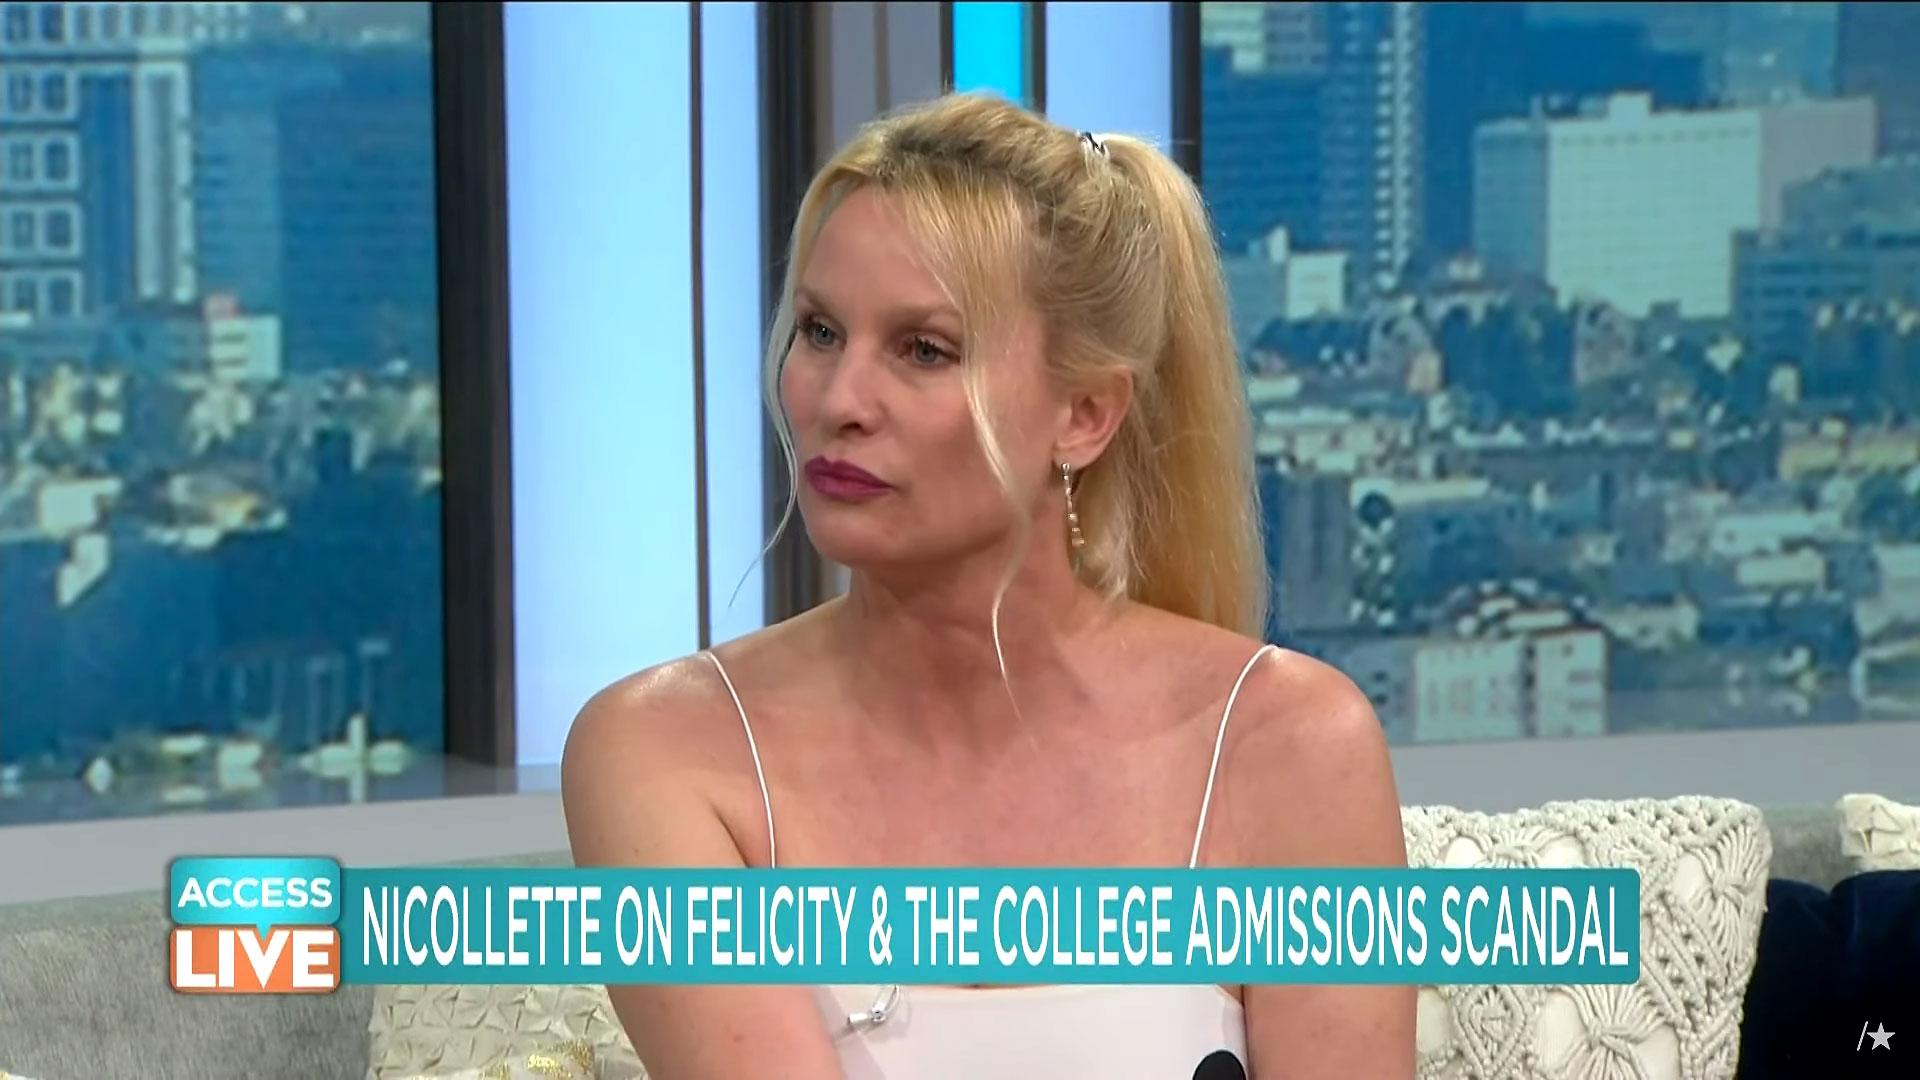 Nicollette Sheridan Slams Former Costar Felicity Huffman's College Scandal - Nicollette Sheridan appears on 'Access Live.